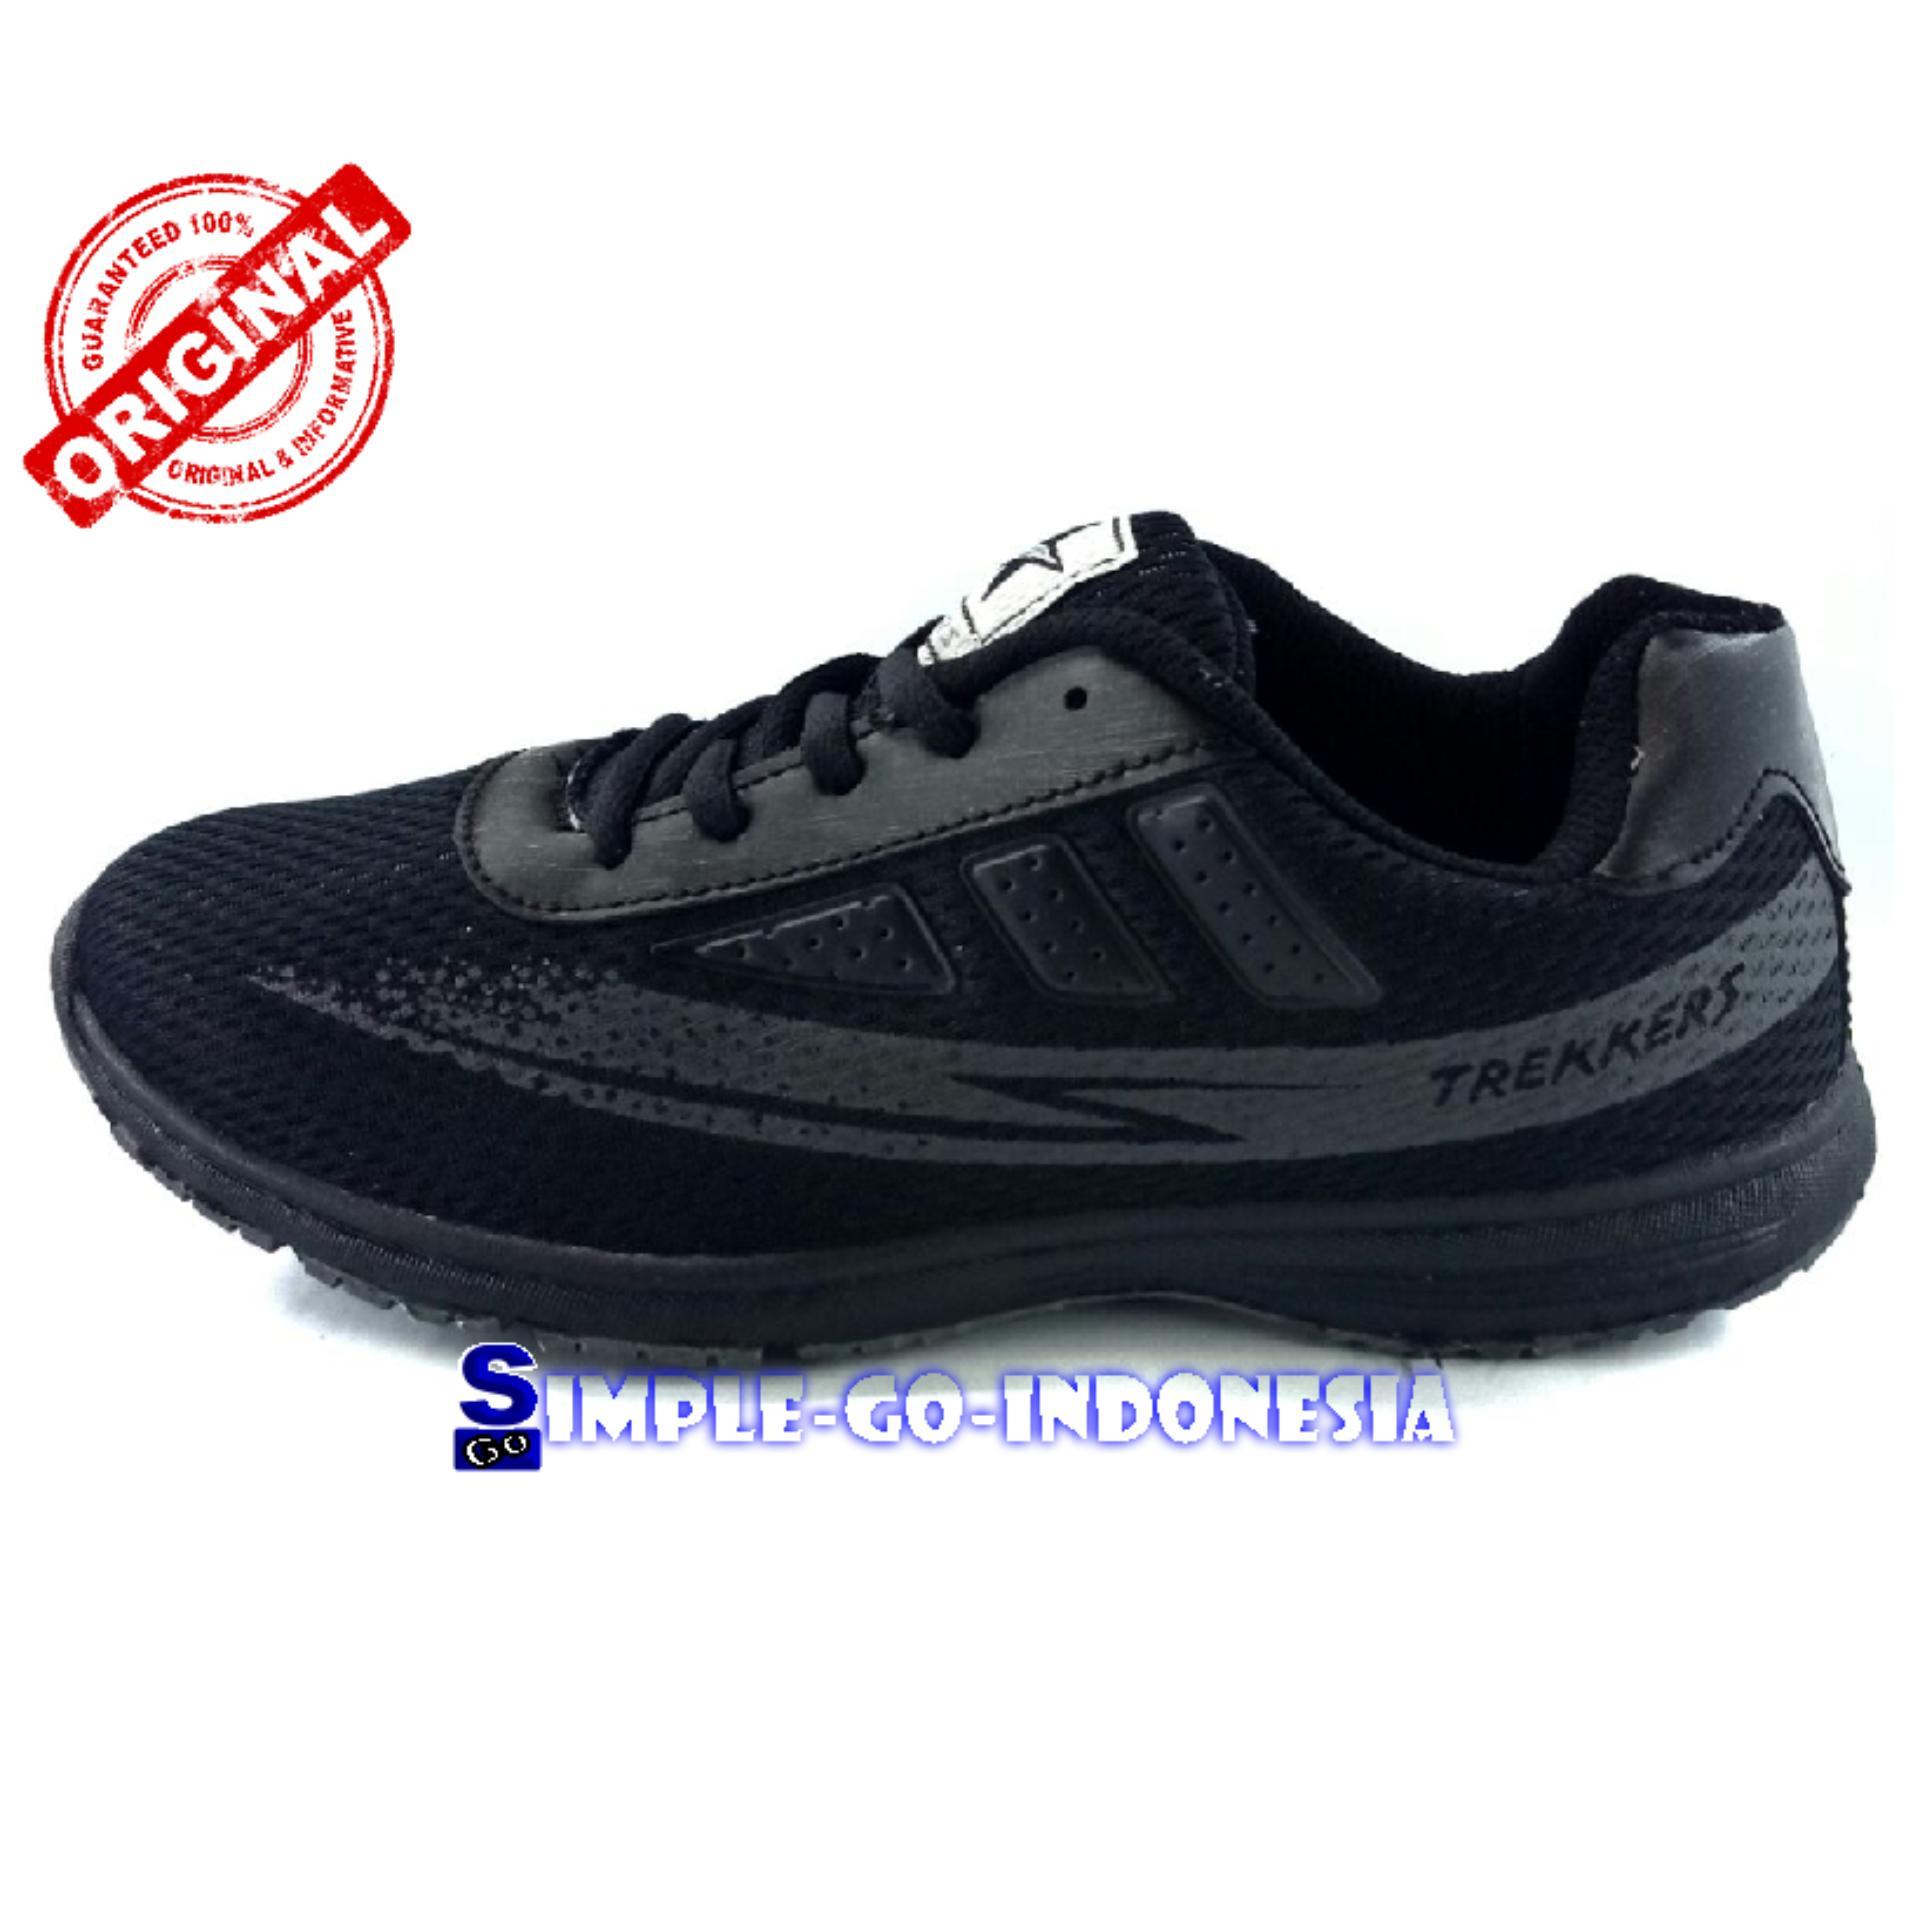 Trekkers sepatu sport wanita bolt hitam abu 37-40